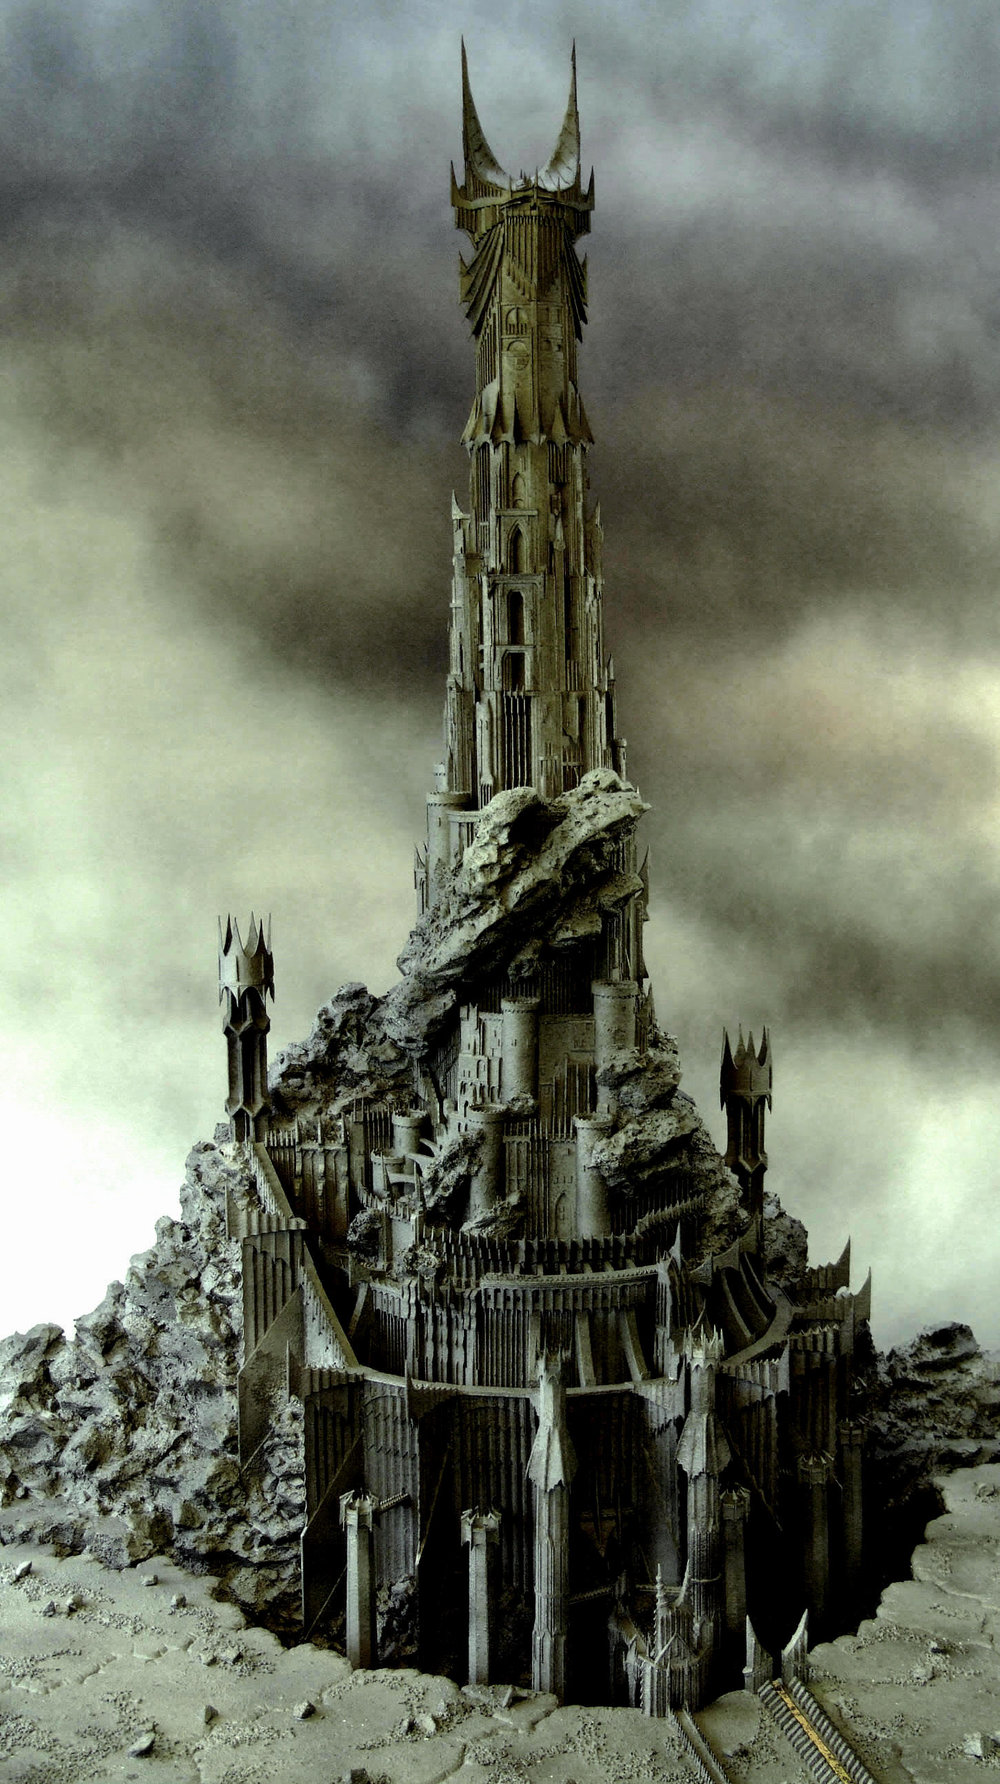 Barad-dur_Dark_Tower_Sauron_I_large.jpg